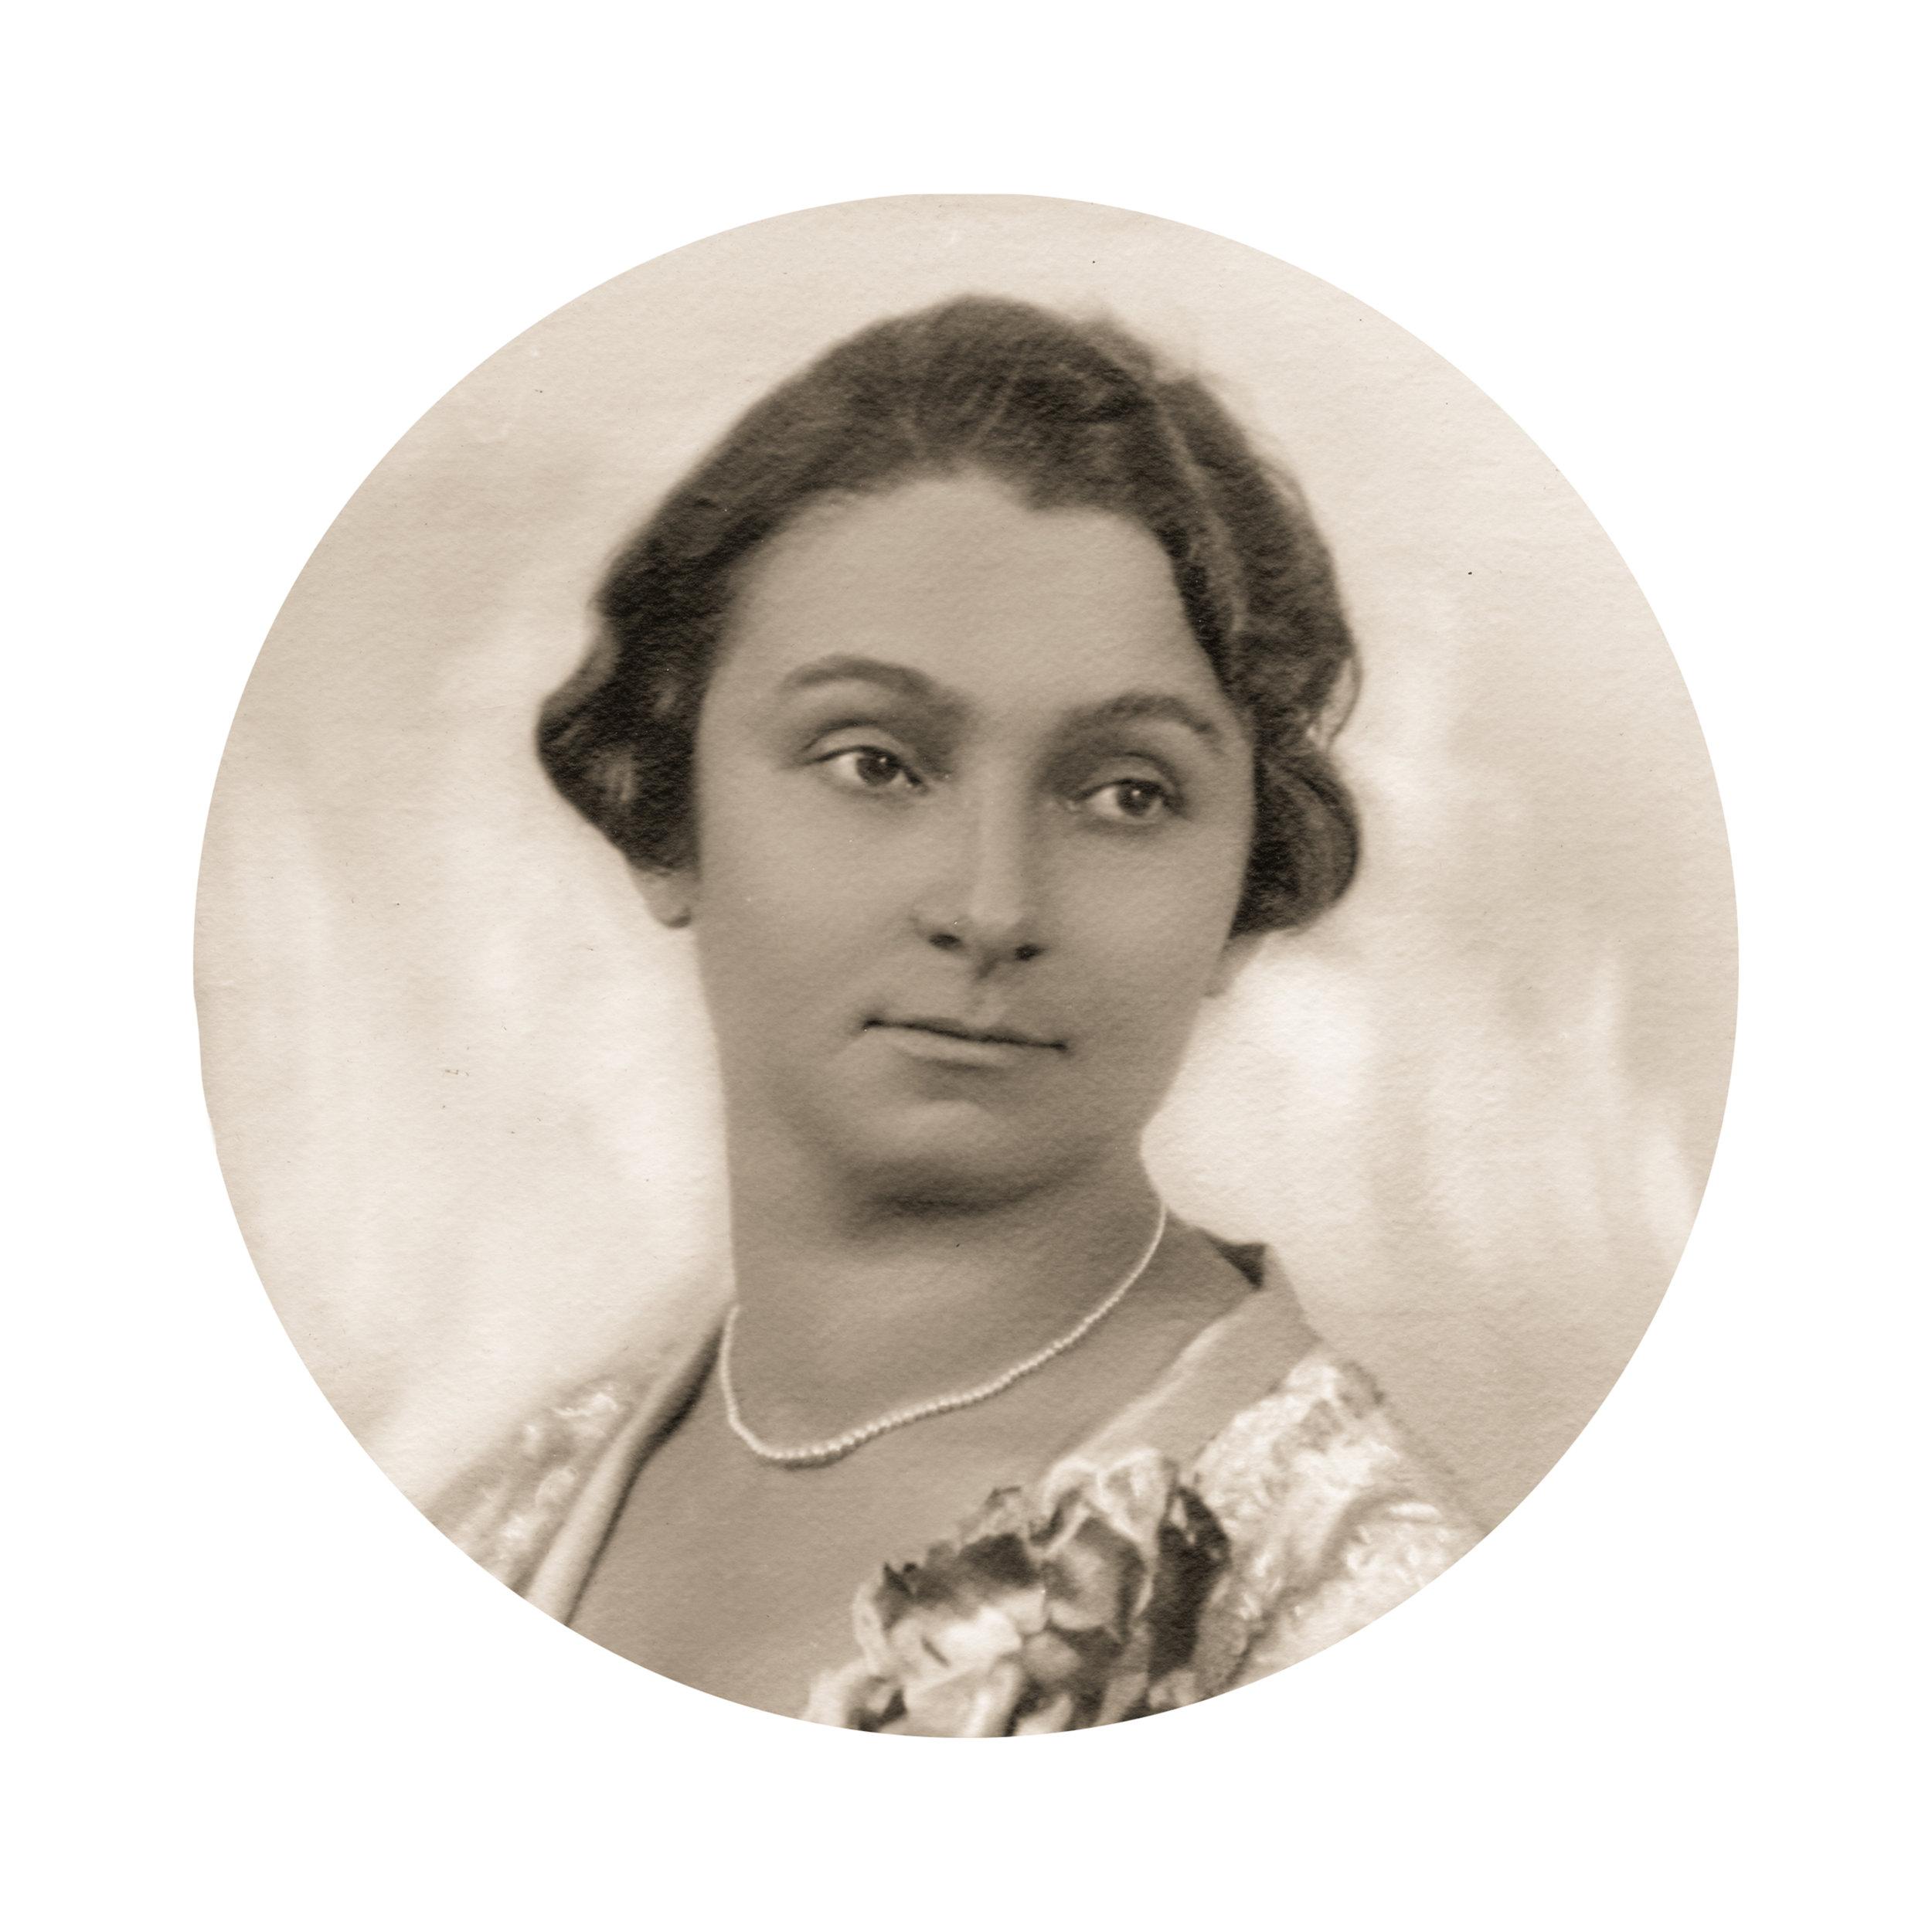 Grandmother, 1929